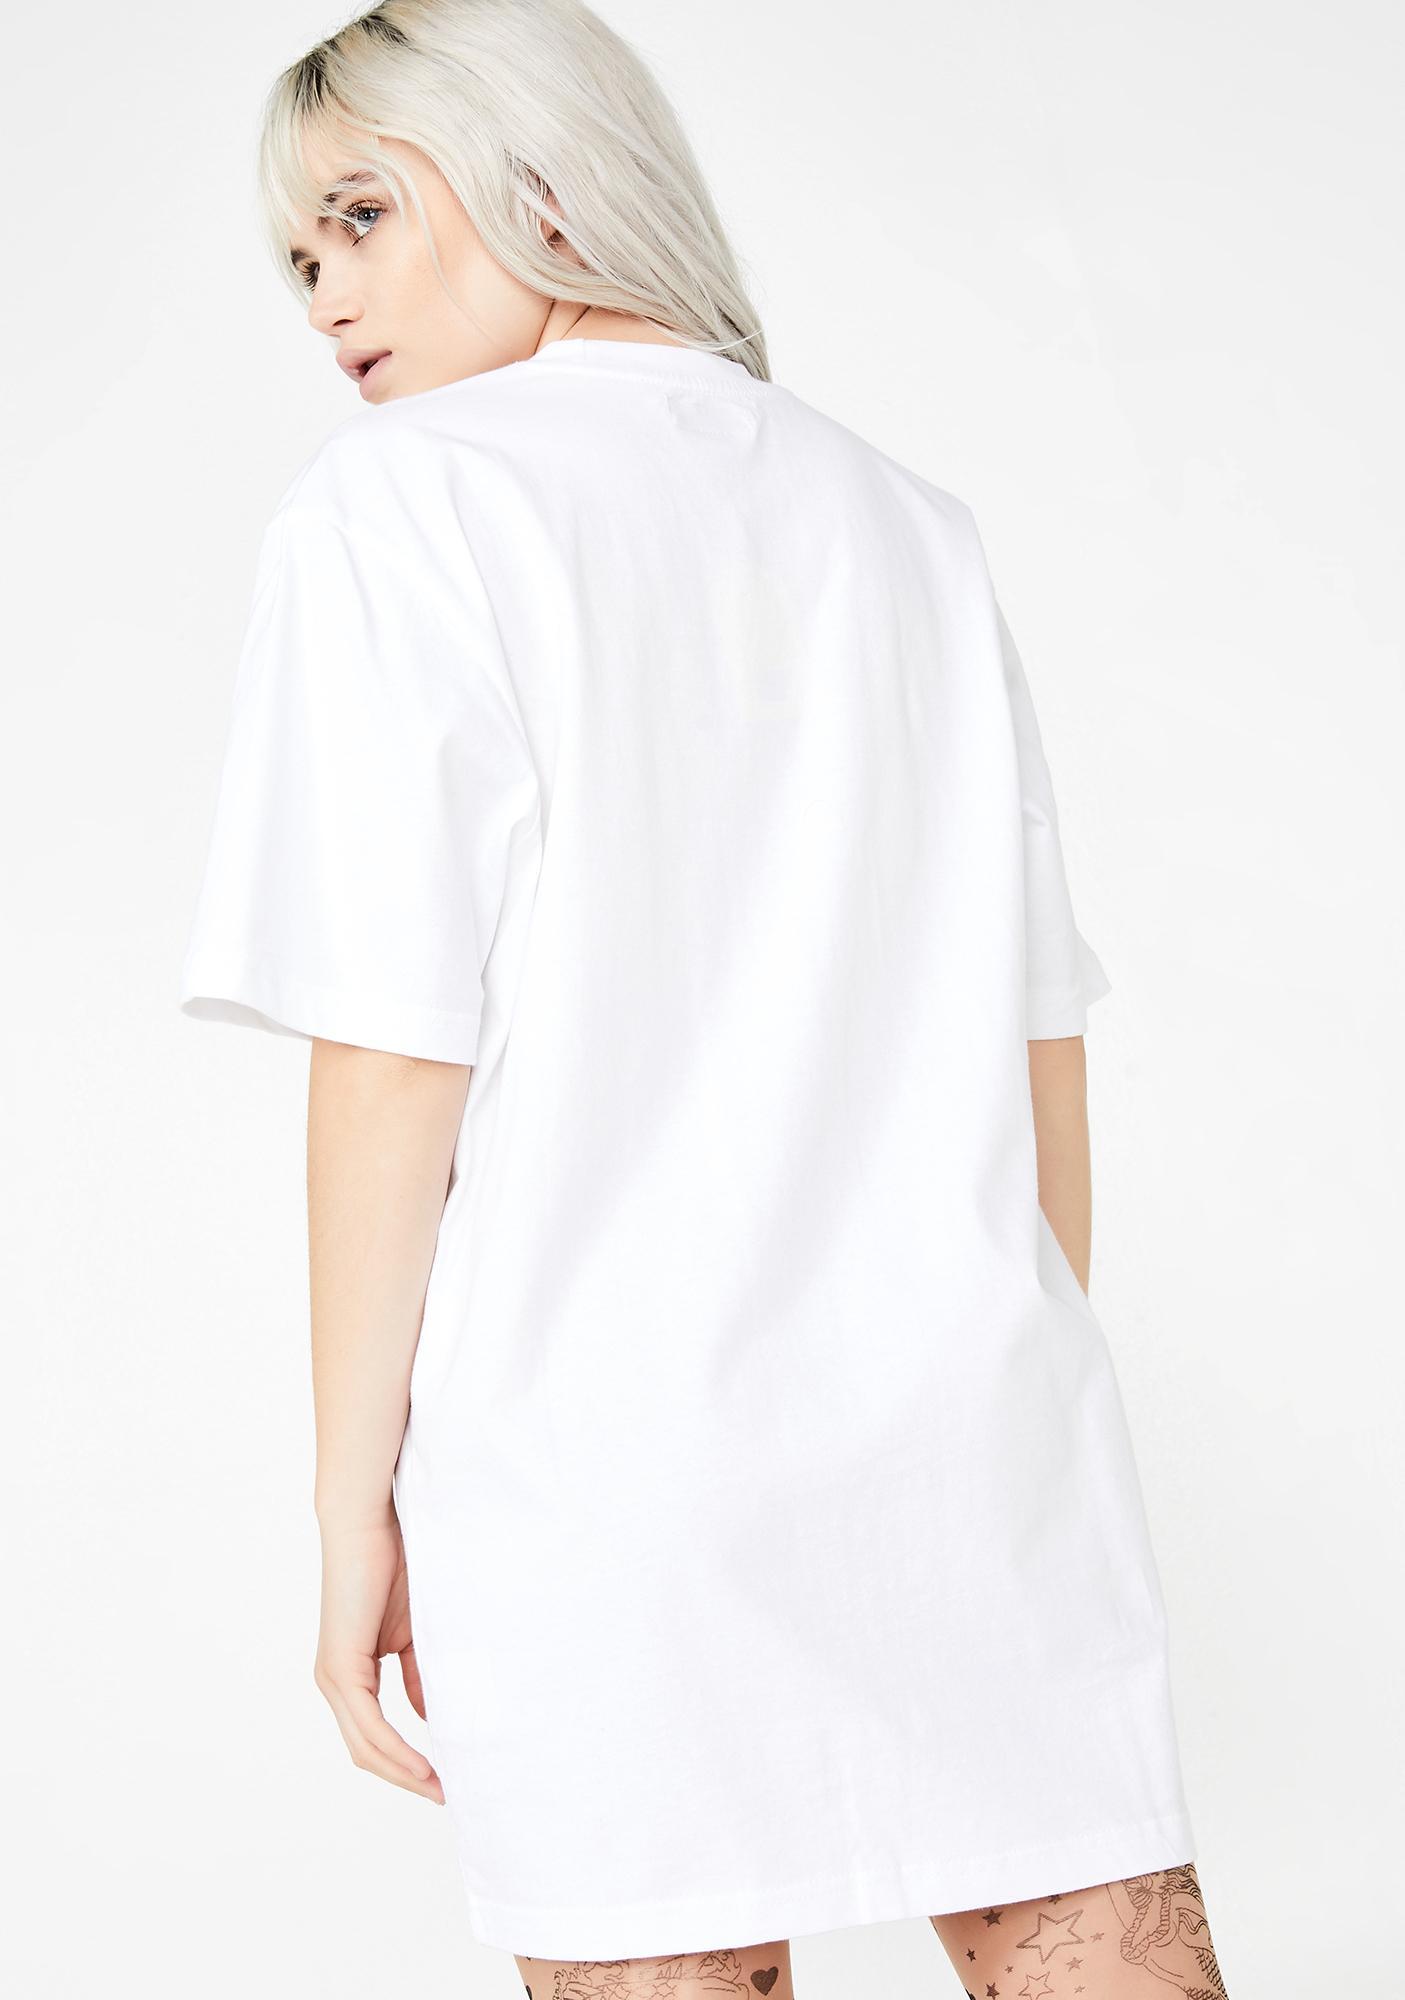 CHINATOWN MARKET Tokyu Hands Graphic T-Shirt